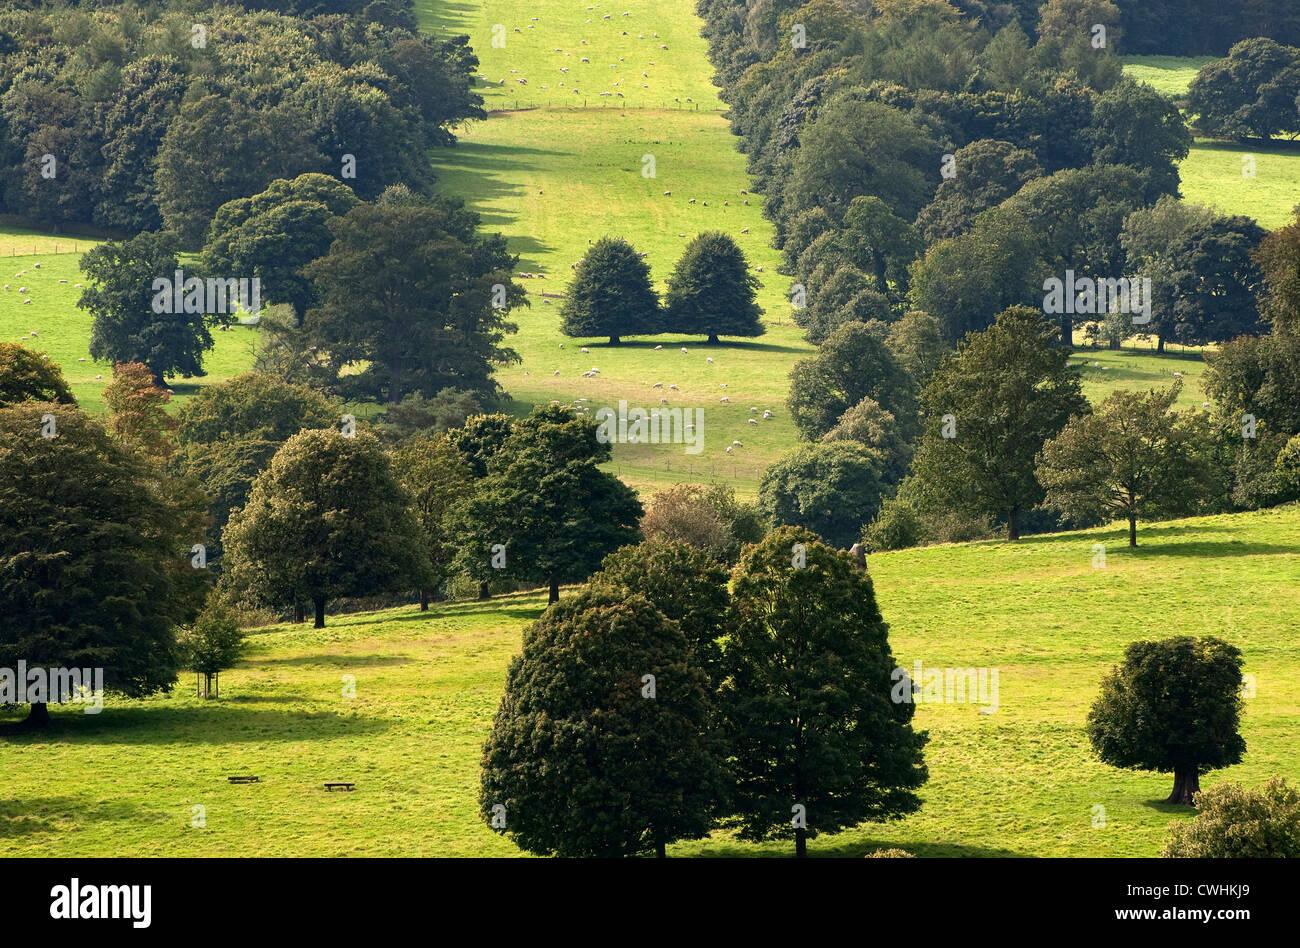 chatsworth estate, derbyshire, england - Stock Image